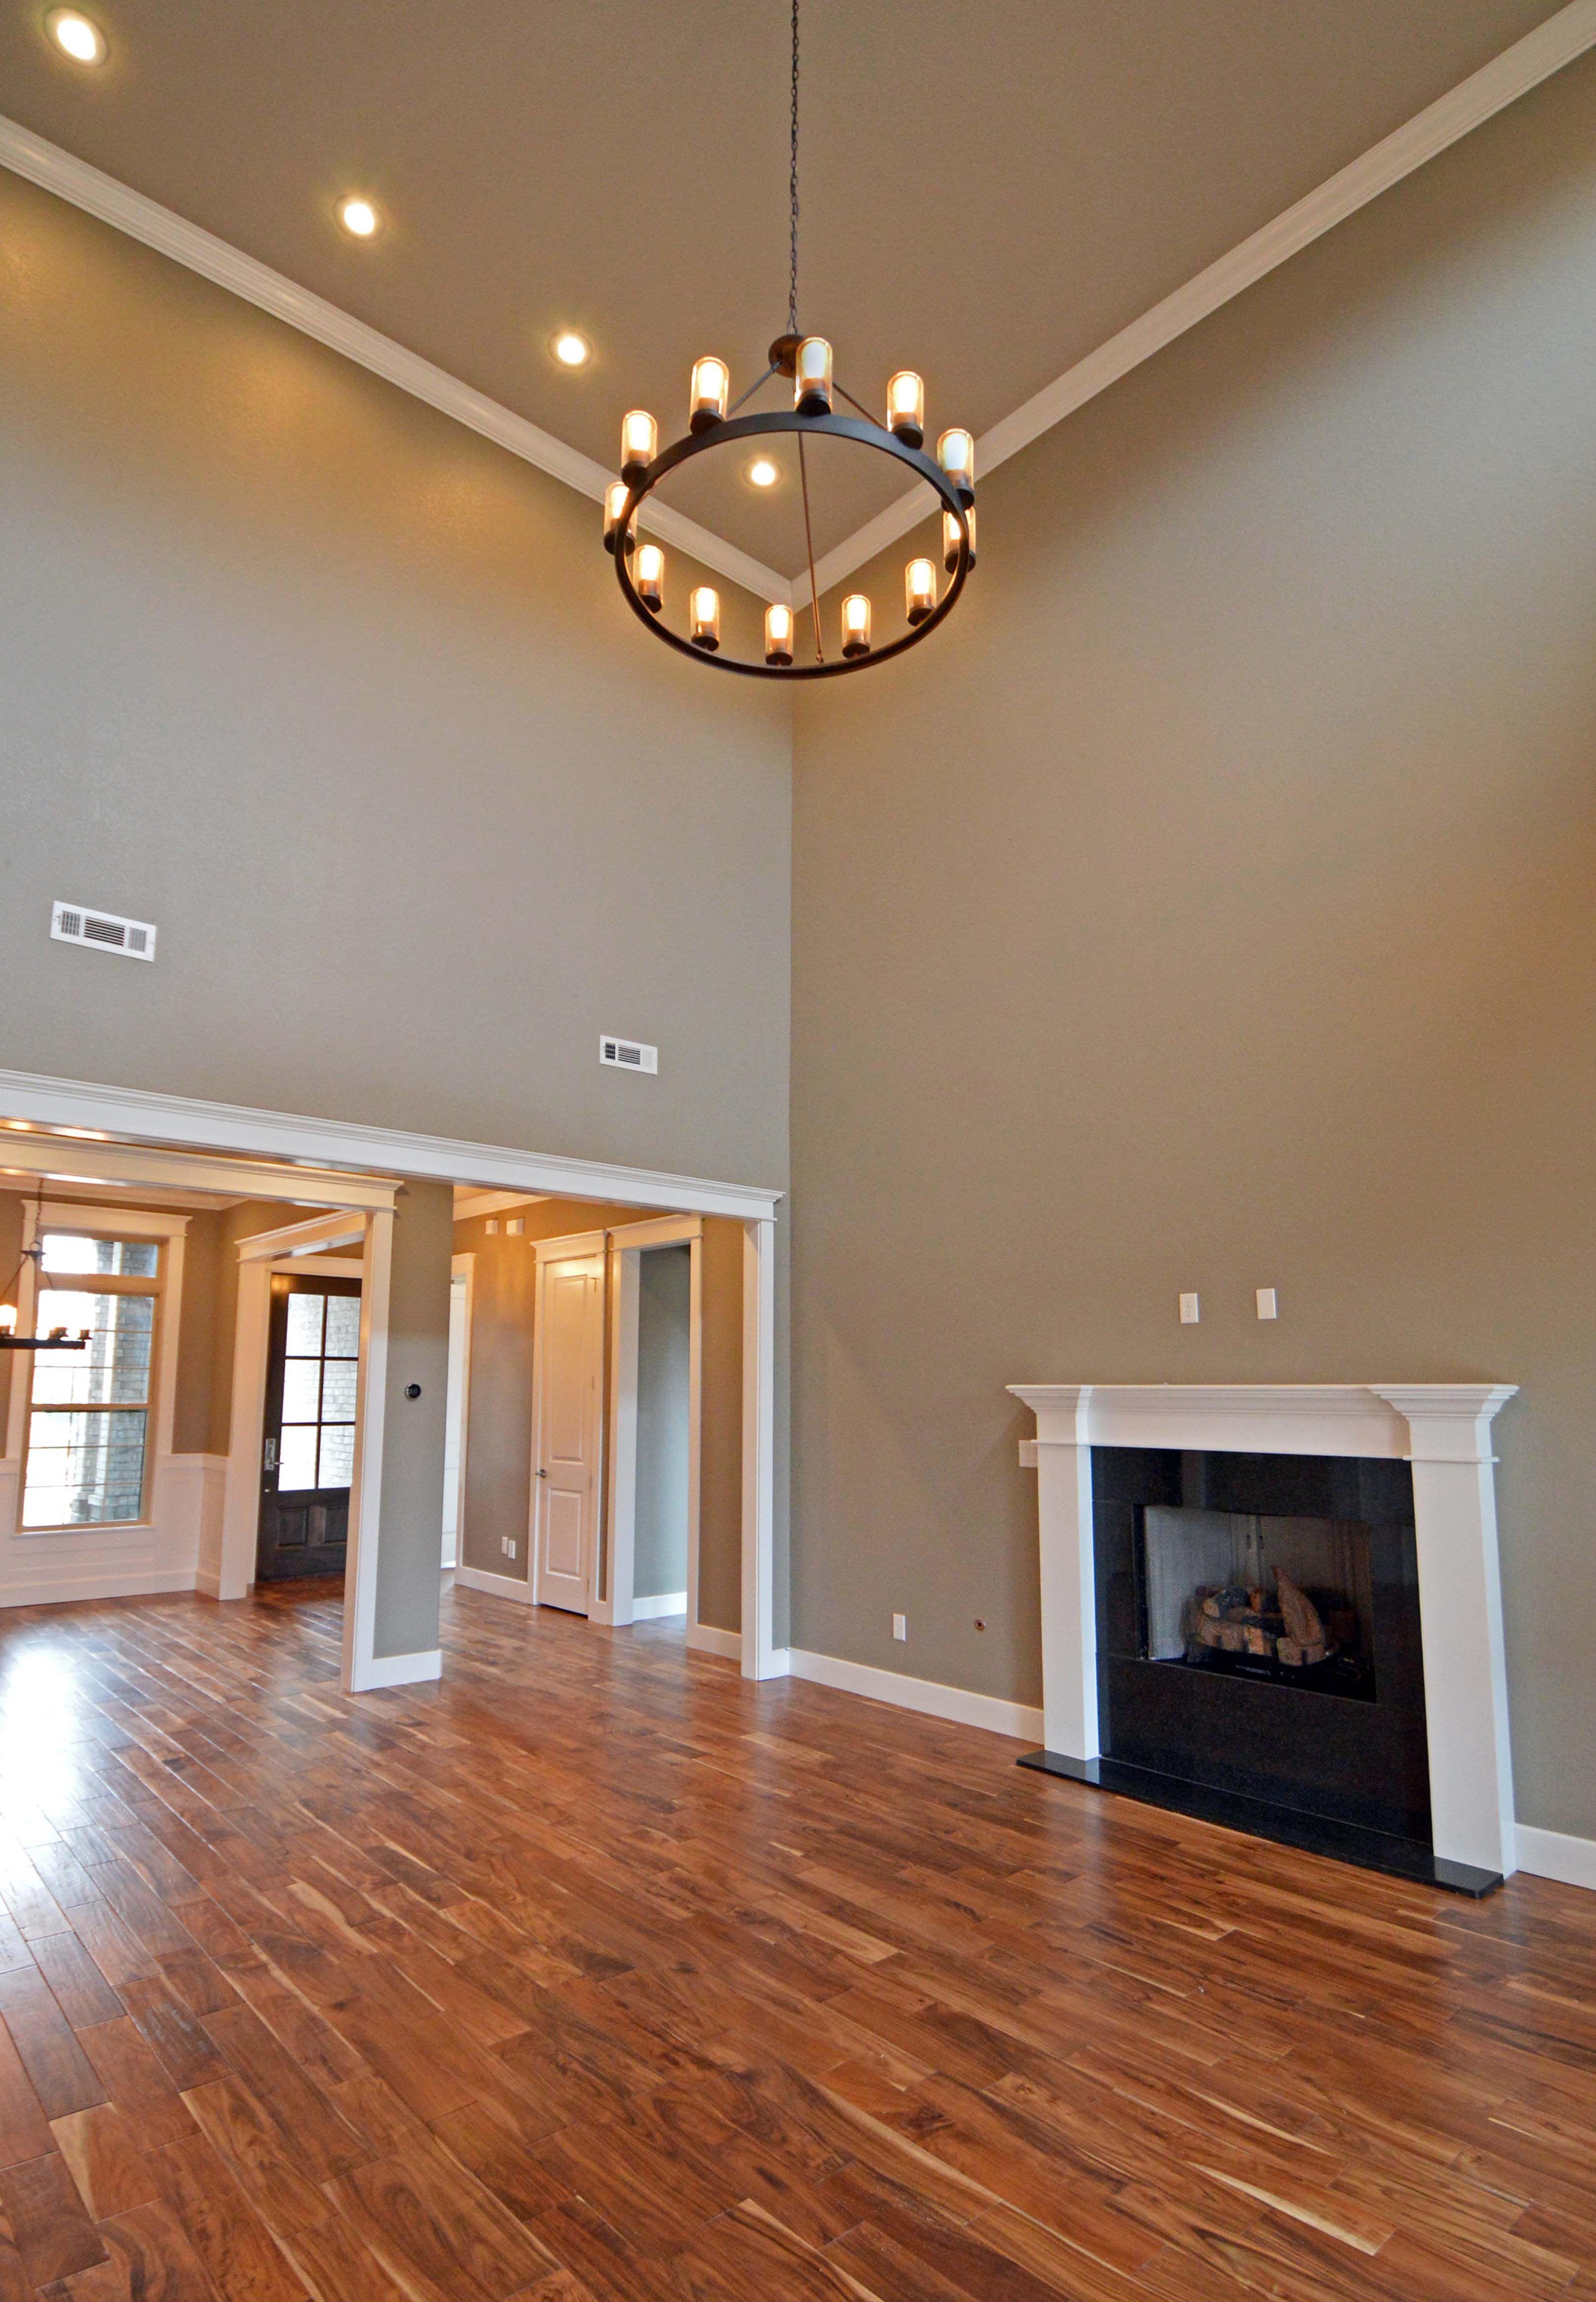 open floor plan featuring acacia wood floors and contemporary open floor plan featuring acacia wood floors and contemporary finishings